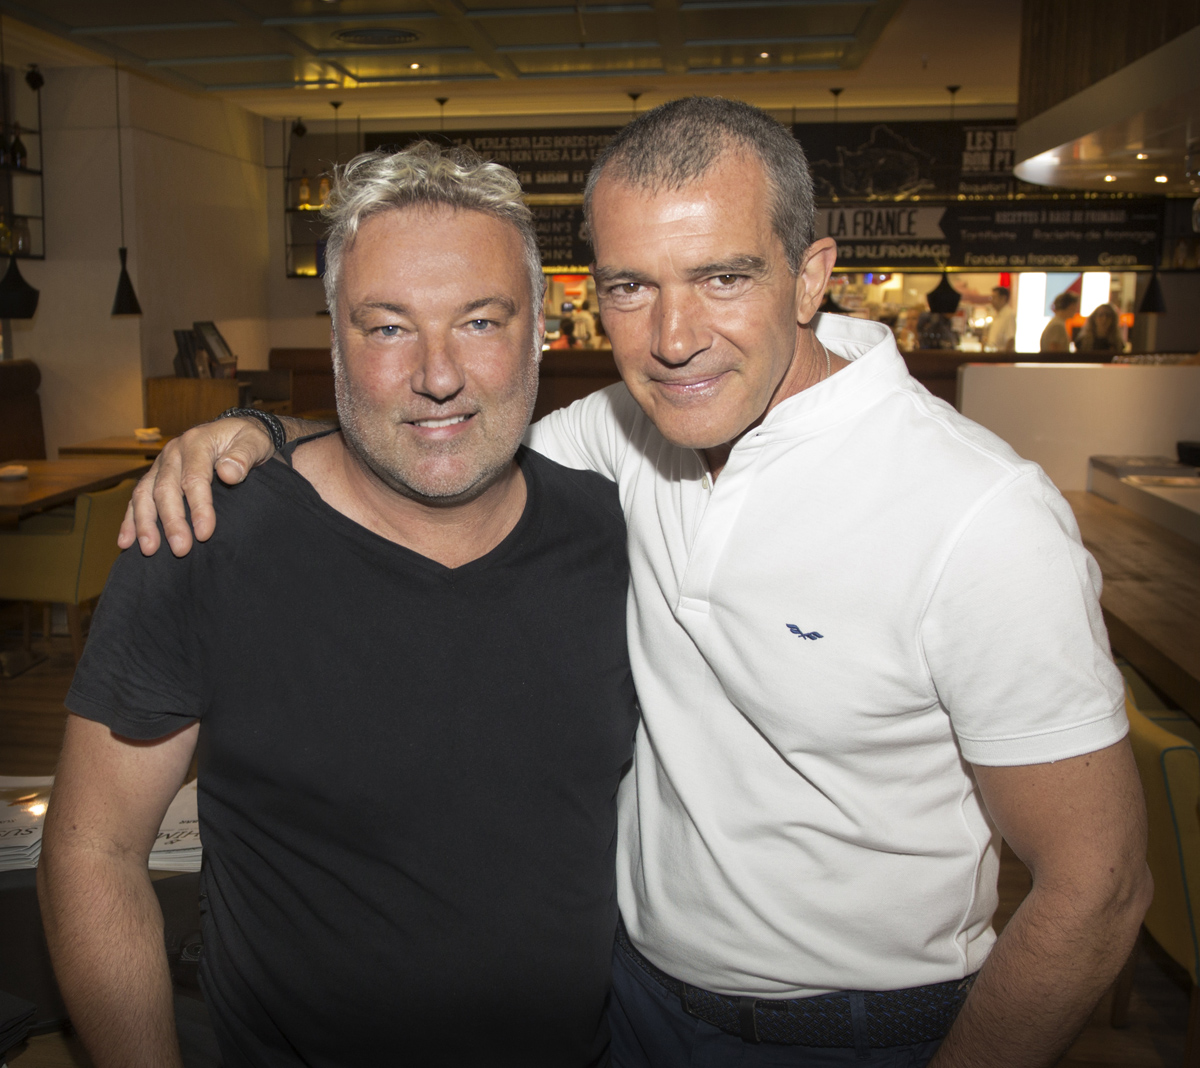 Antonio Banderas in Marbella with Gary Edwards Photographer